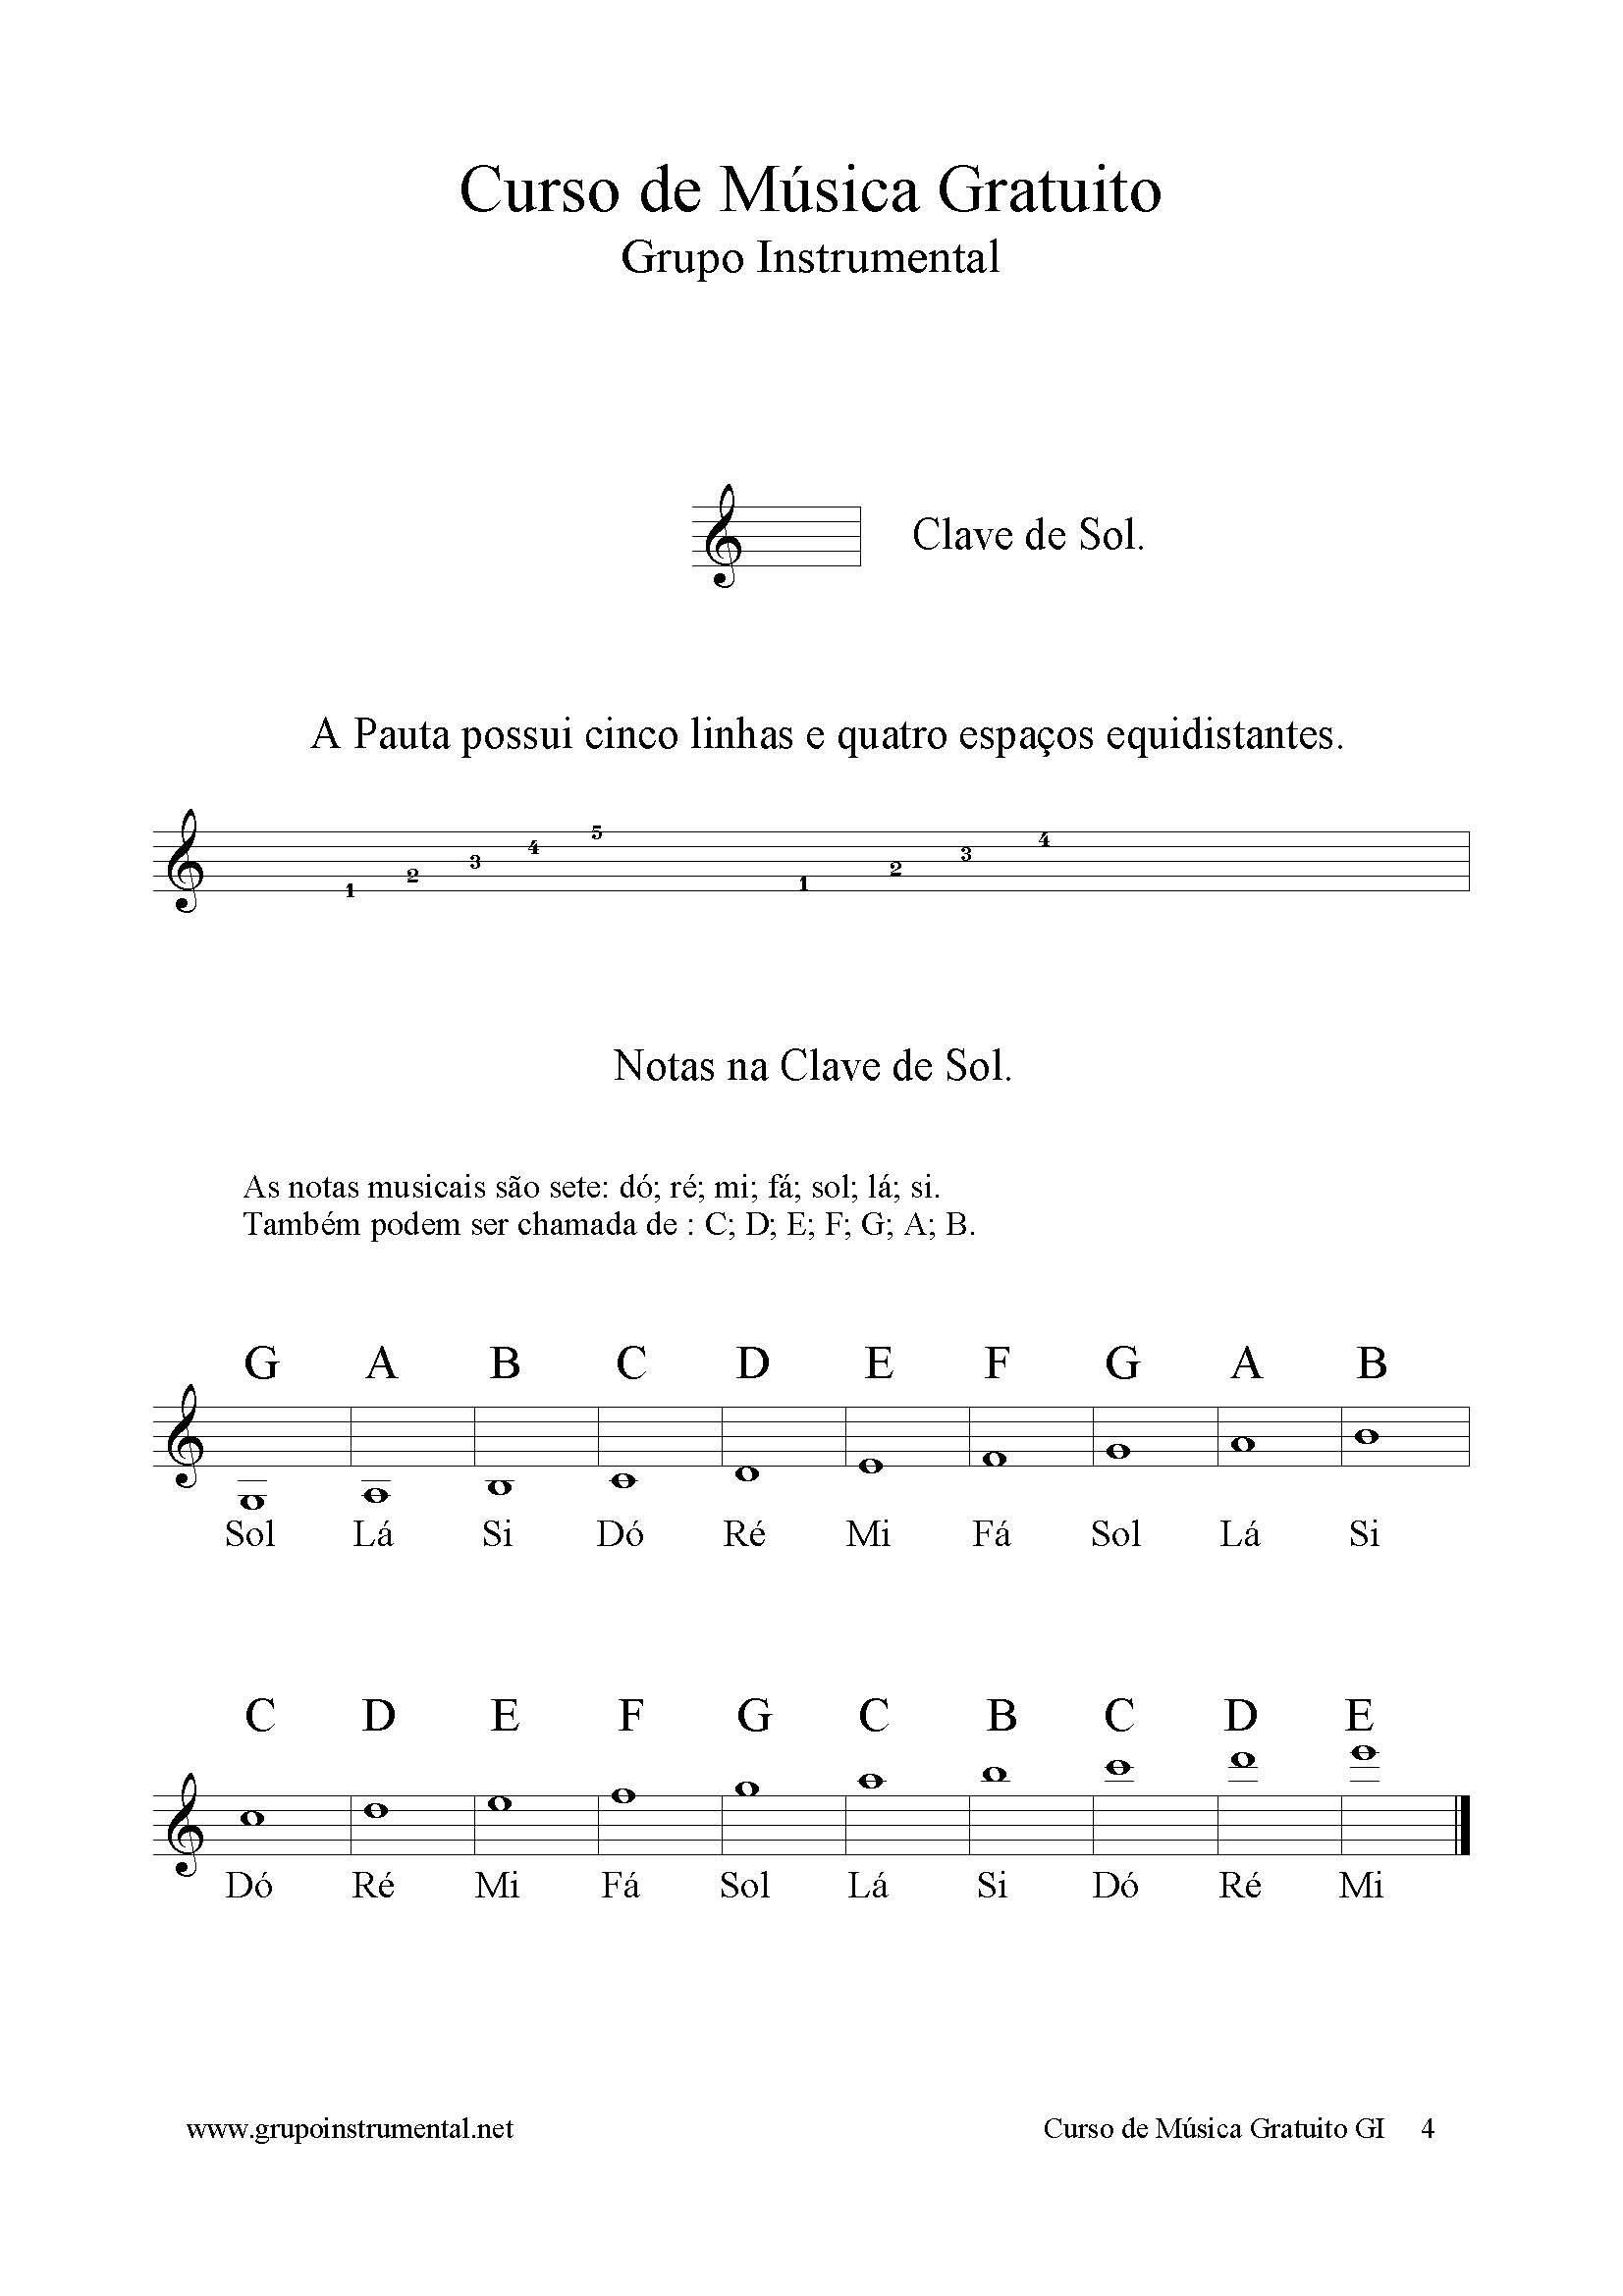 Torcato, Marcelo: Curso de Música Gratuito: Grupo Instrumental